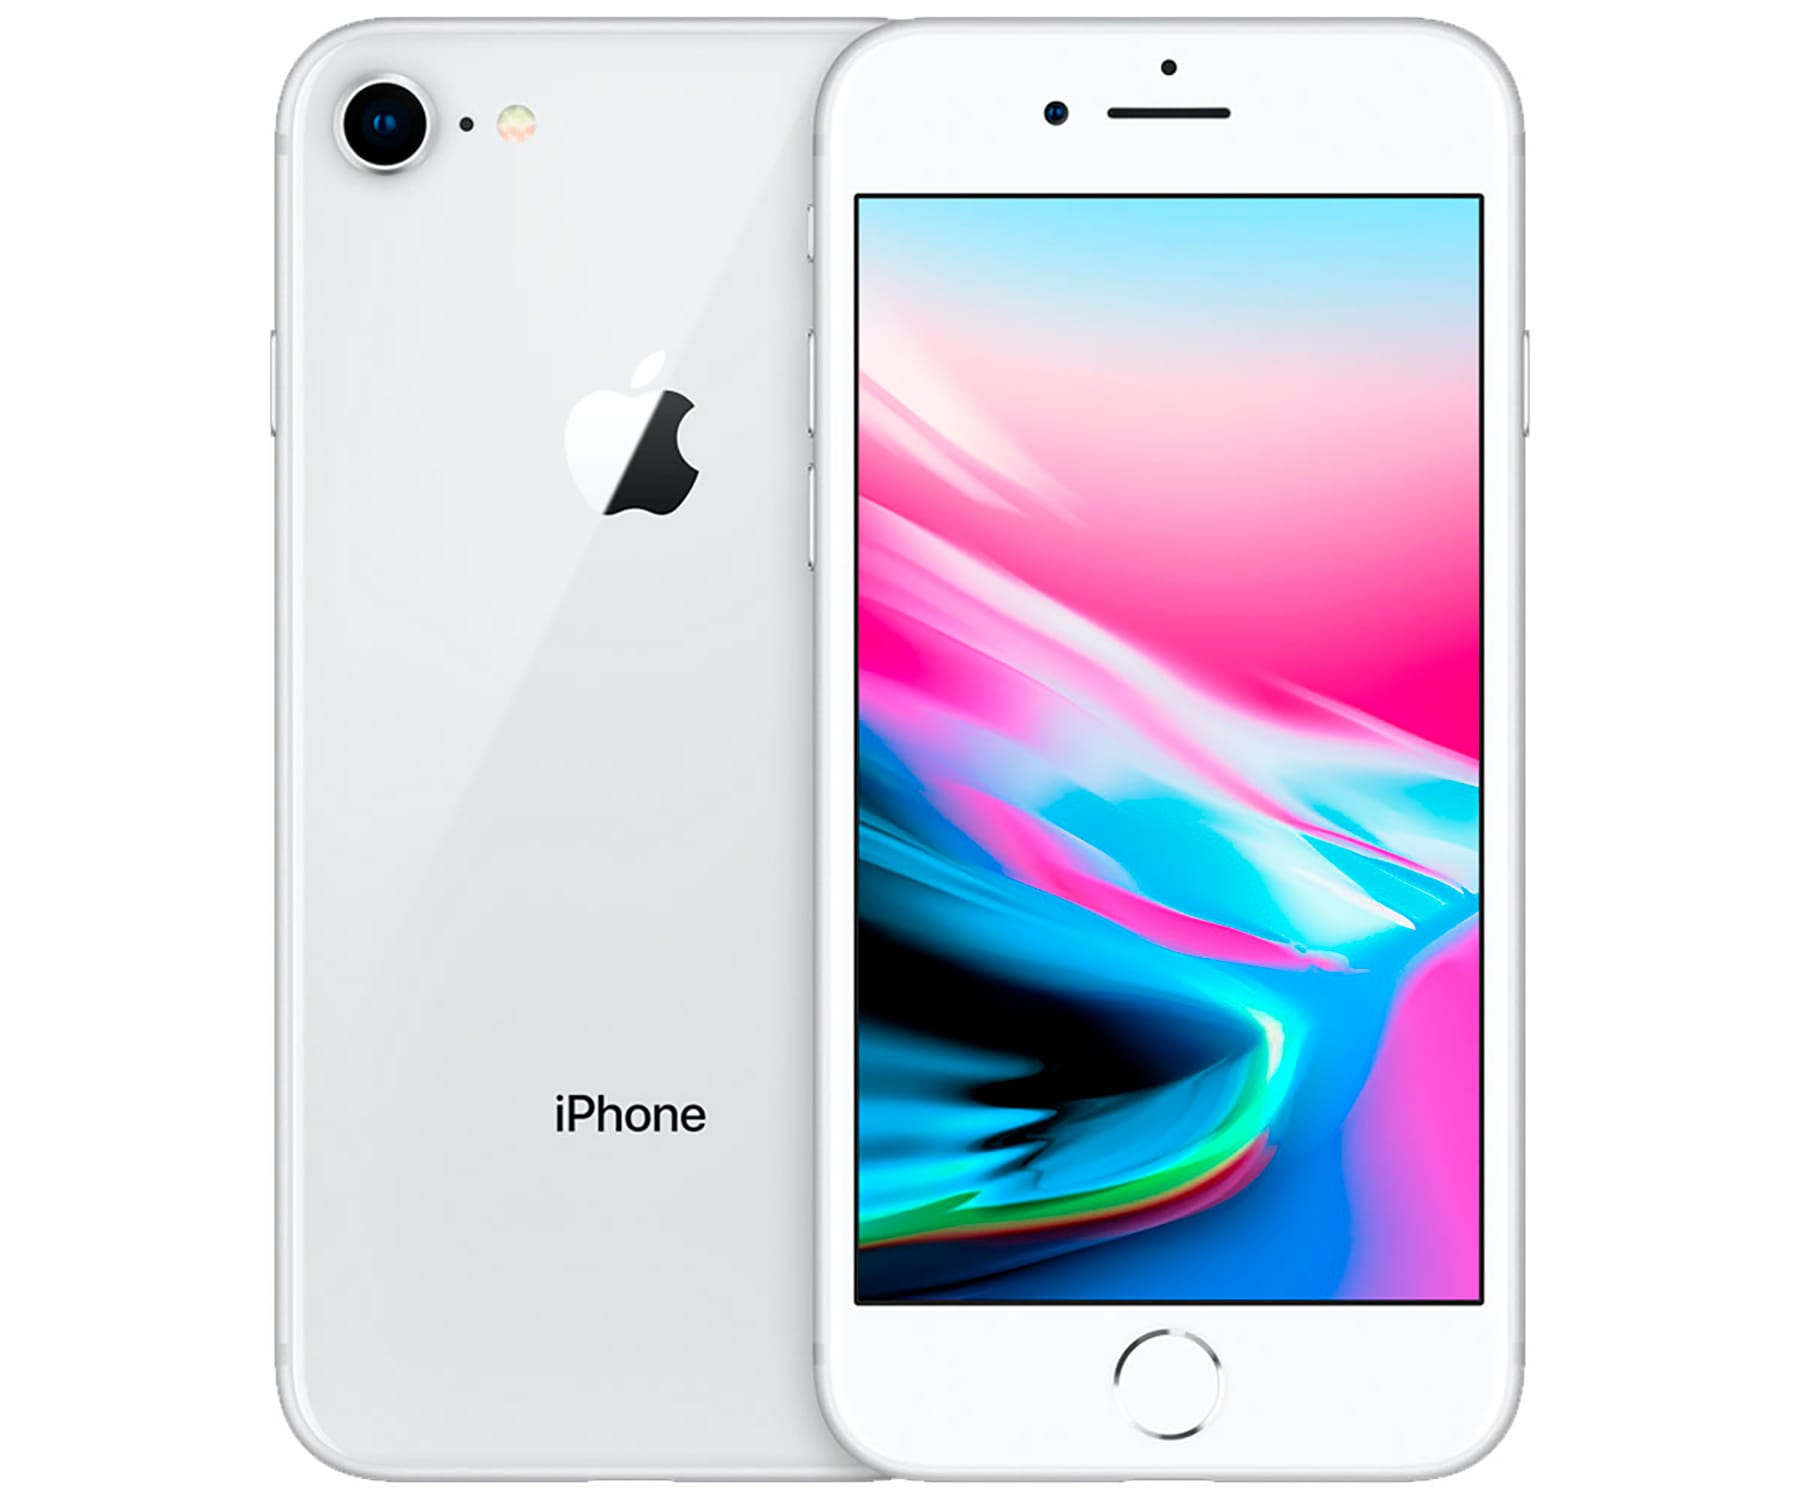 APPLE IPHONE 8 256GB PLATA REACONDICIONADO CPO MÓVIL 4G 4.7'' RETINA HD/6CORE/256GB/2GB RAM/12MP/7MP